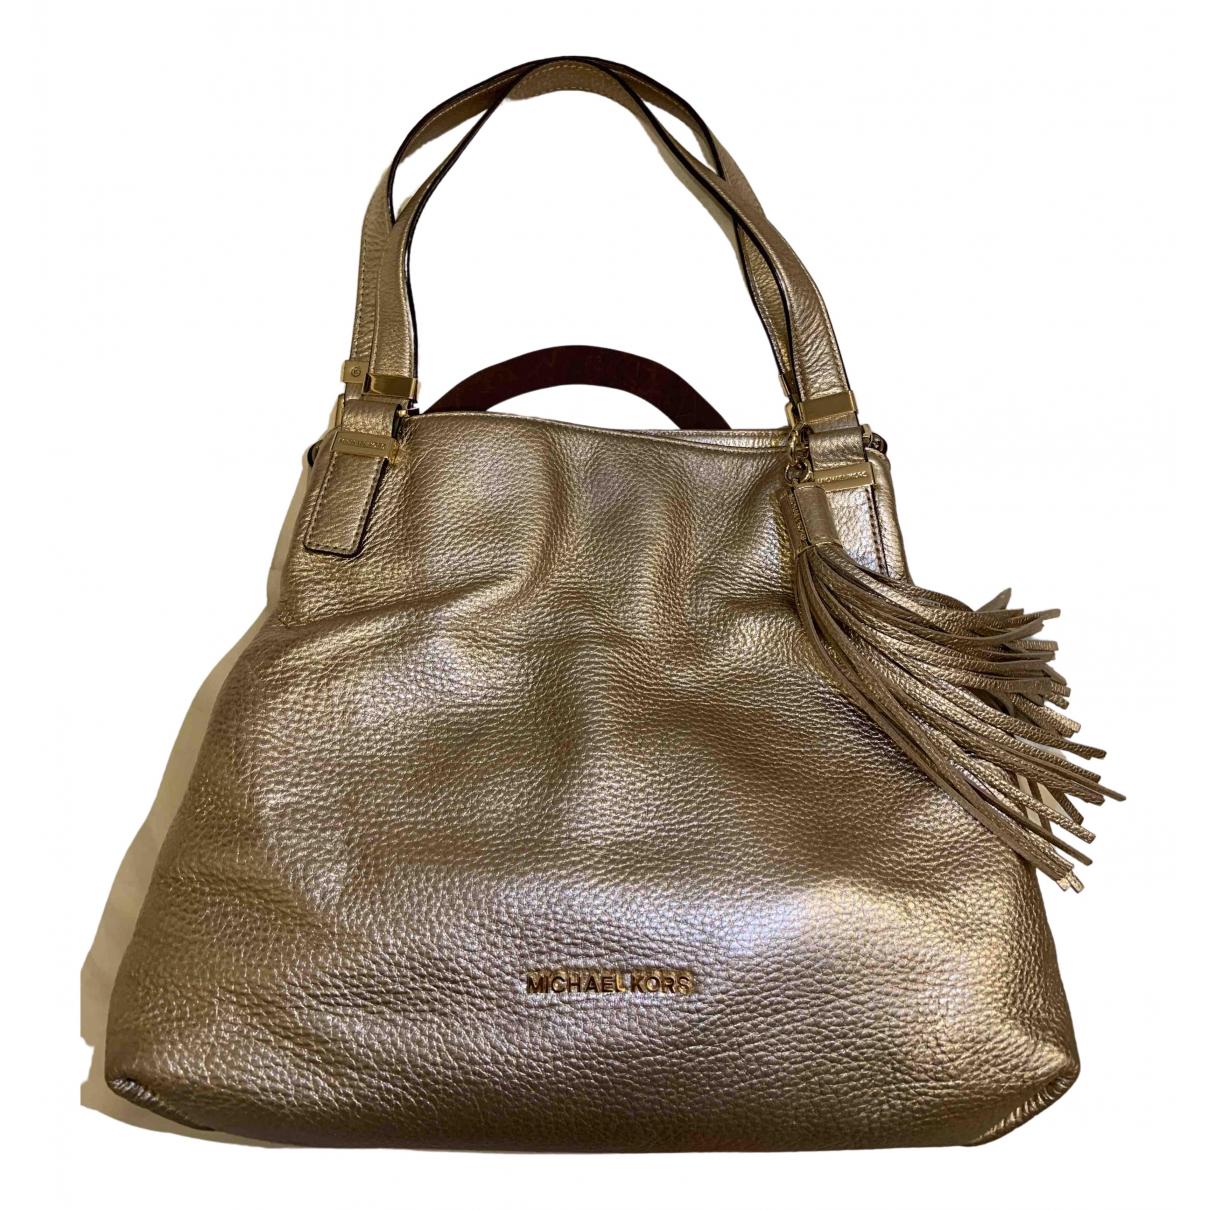 Michael Kors N Metallic Leather handbag for Women N